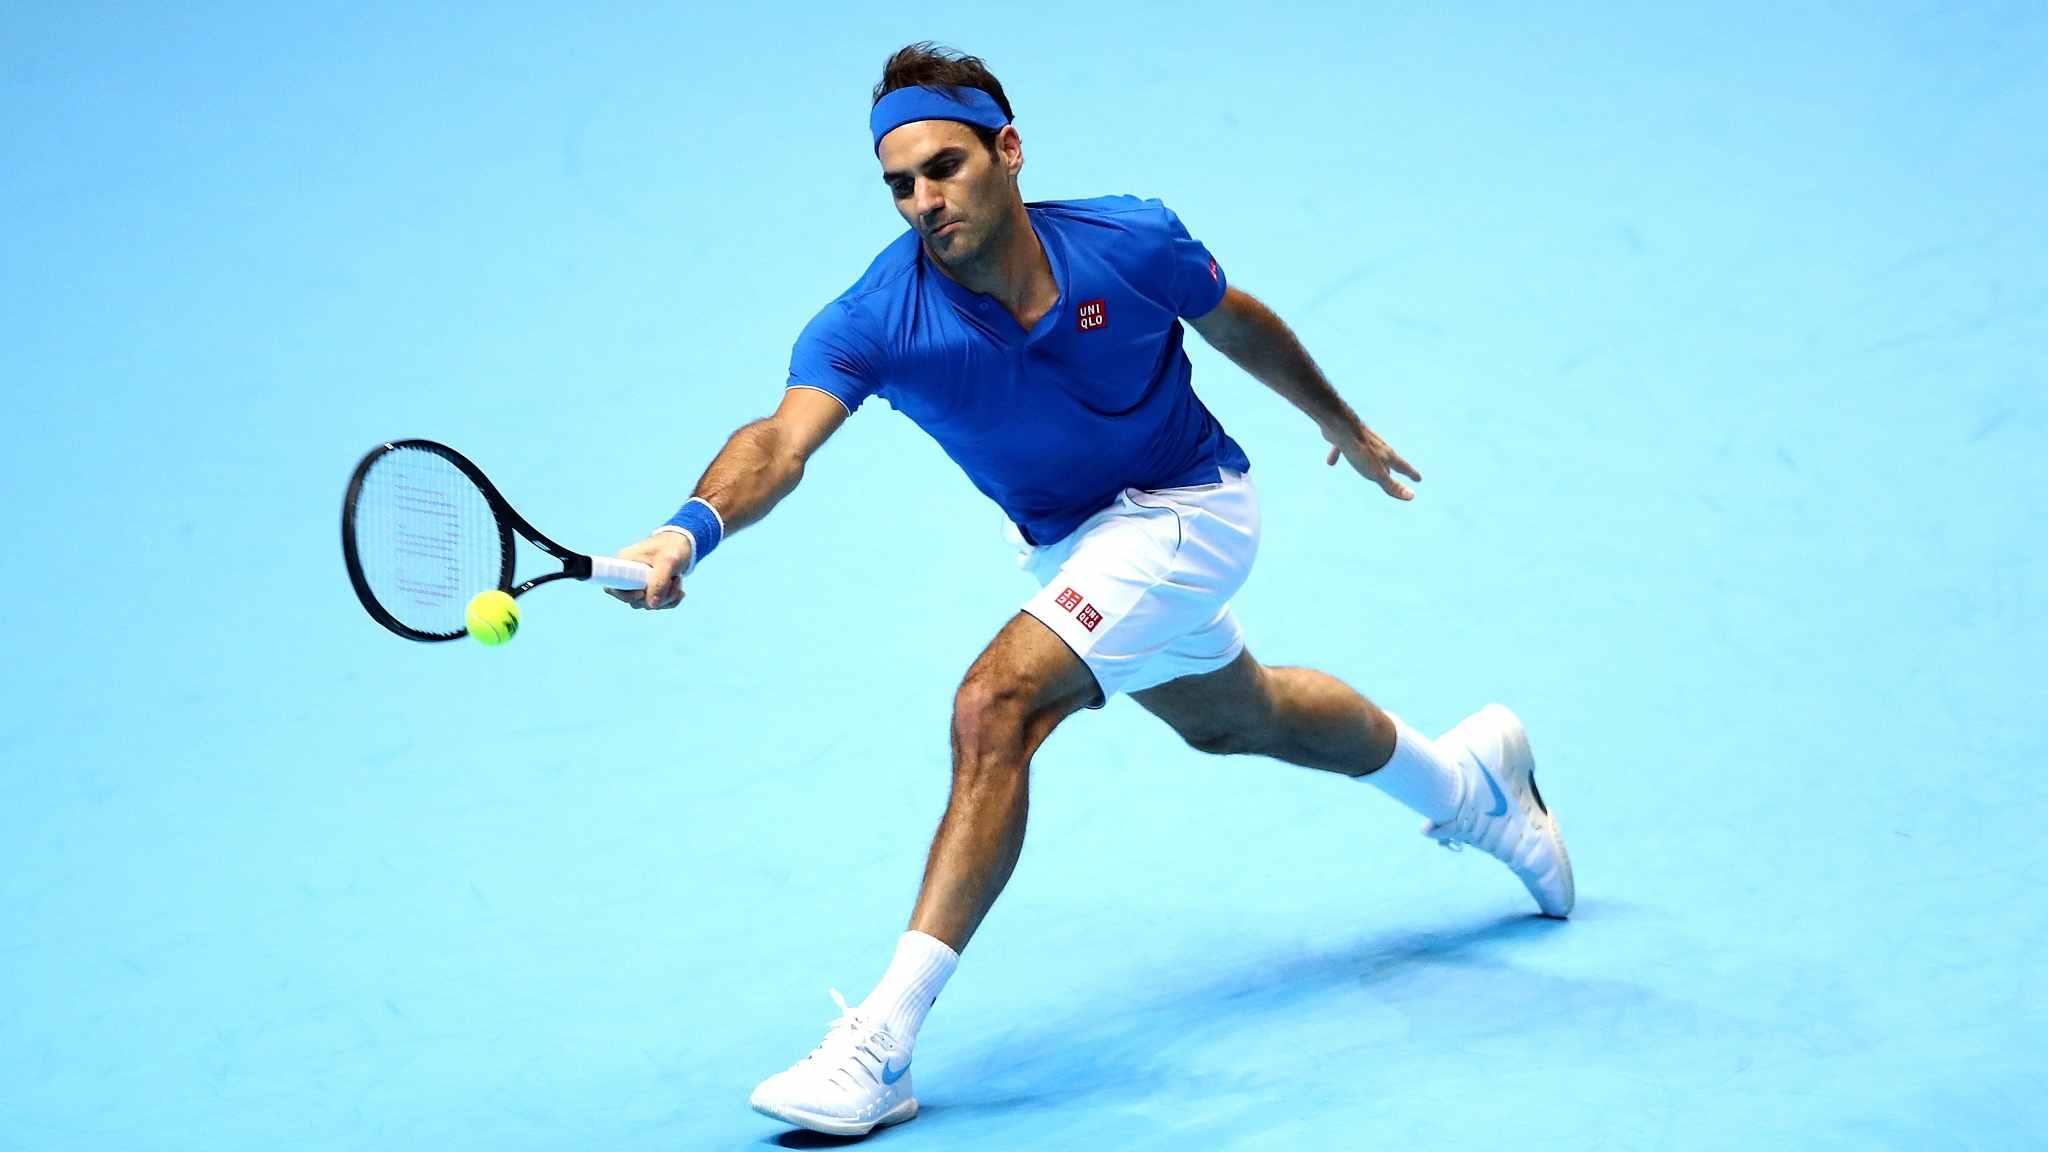 Thiem wins second set to level Australian Open final against Djokovic